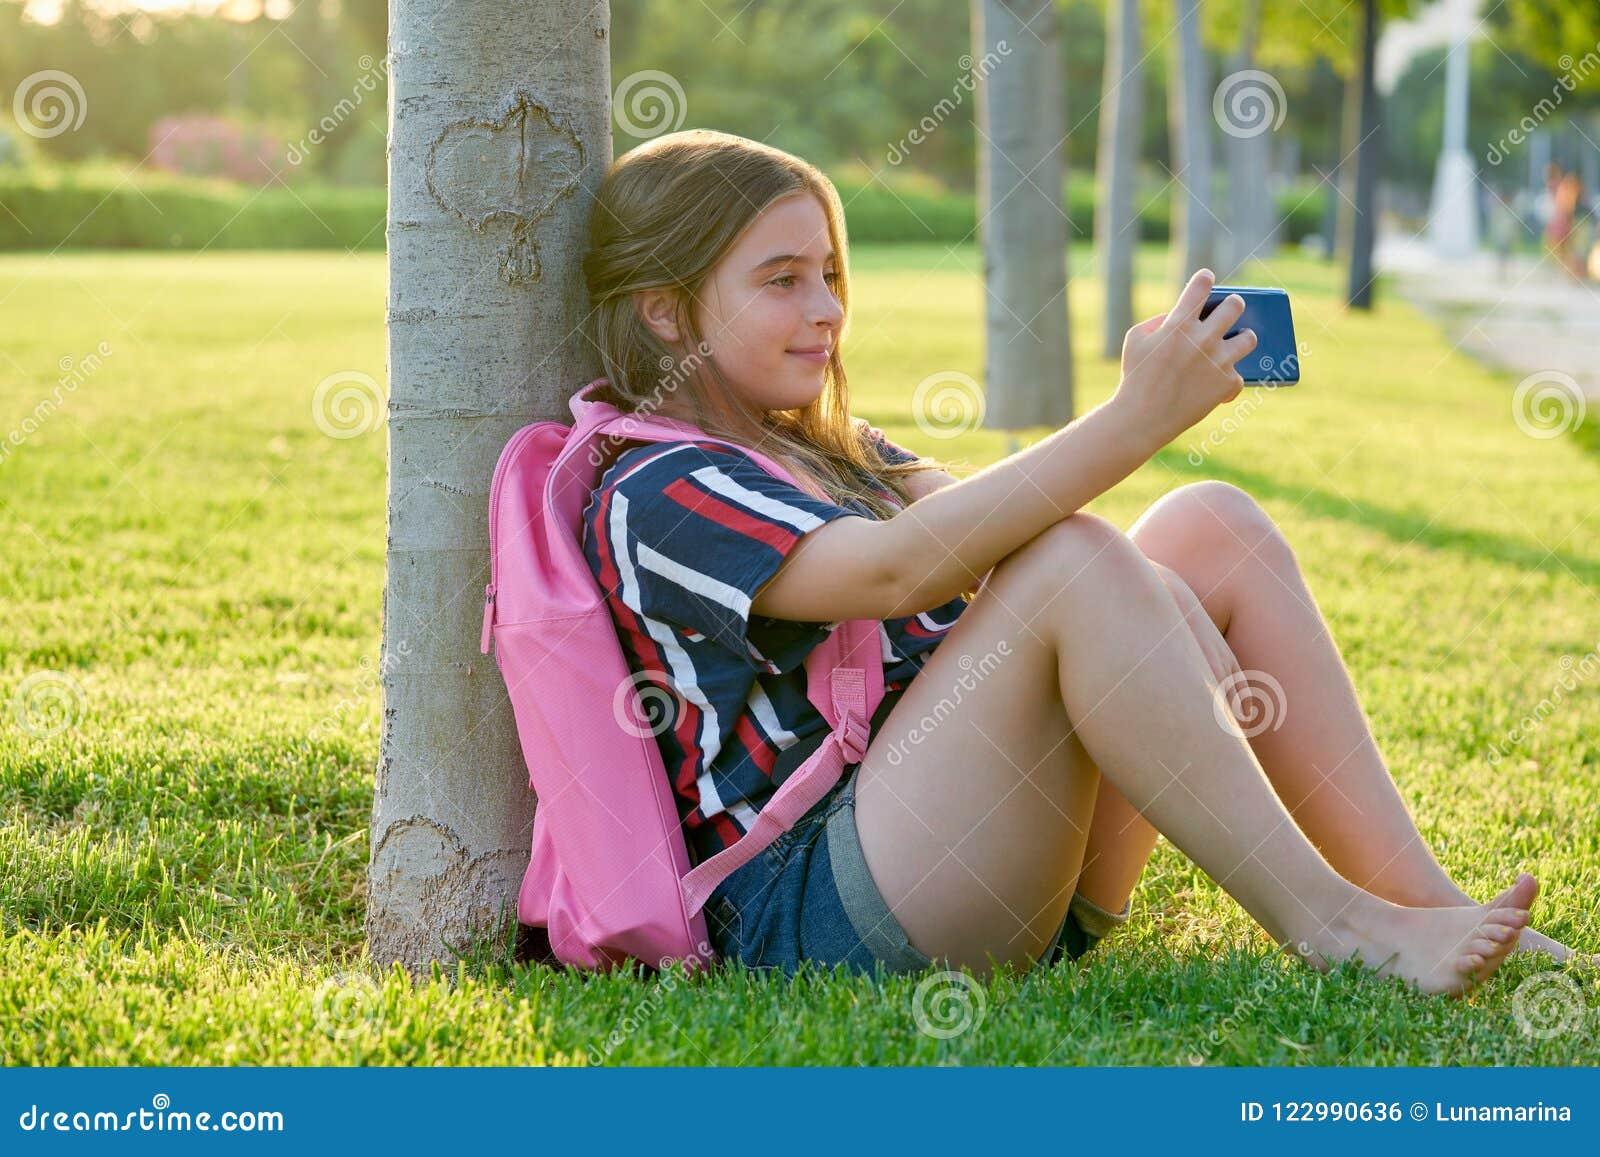 https://thumbs.dreamstime.com/z/blond-student-kid-girl-smartphone-park-blond-student-kid-girl-smartphone-park-back-to-school-sit-grass-122990636.jpg